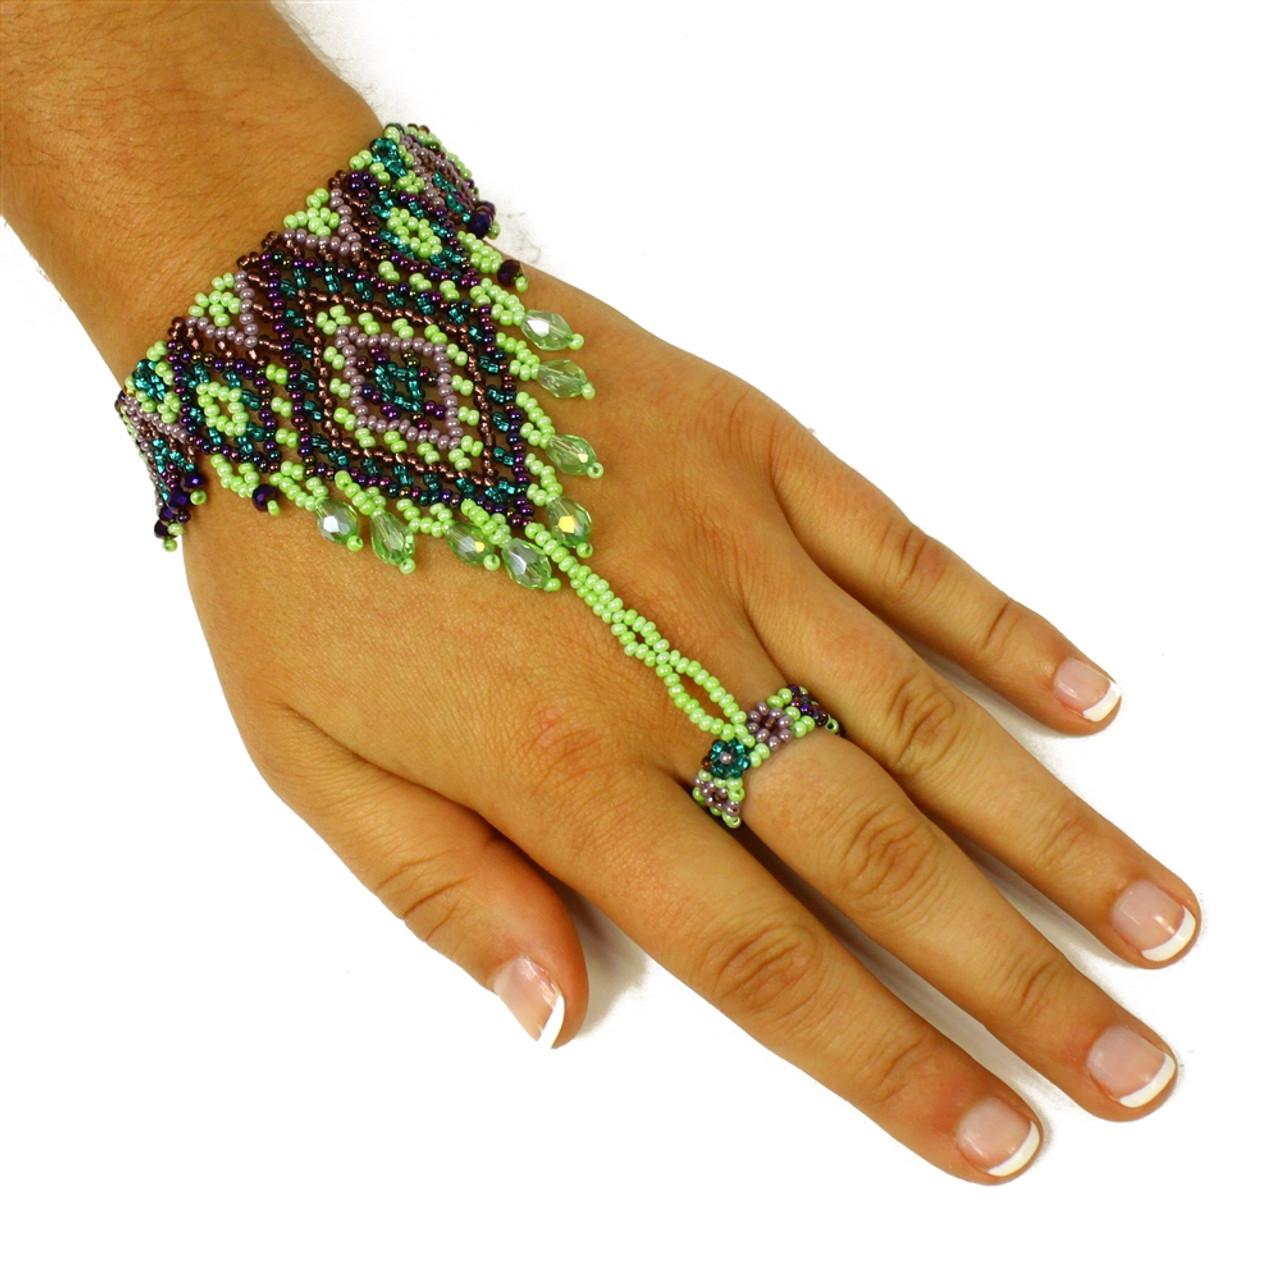 Handmade Crocheted Cuff Bracelet  Multi-colored  Toggle Button Closure